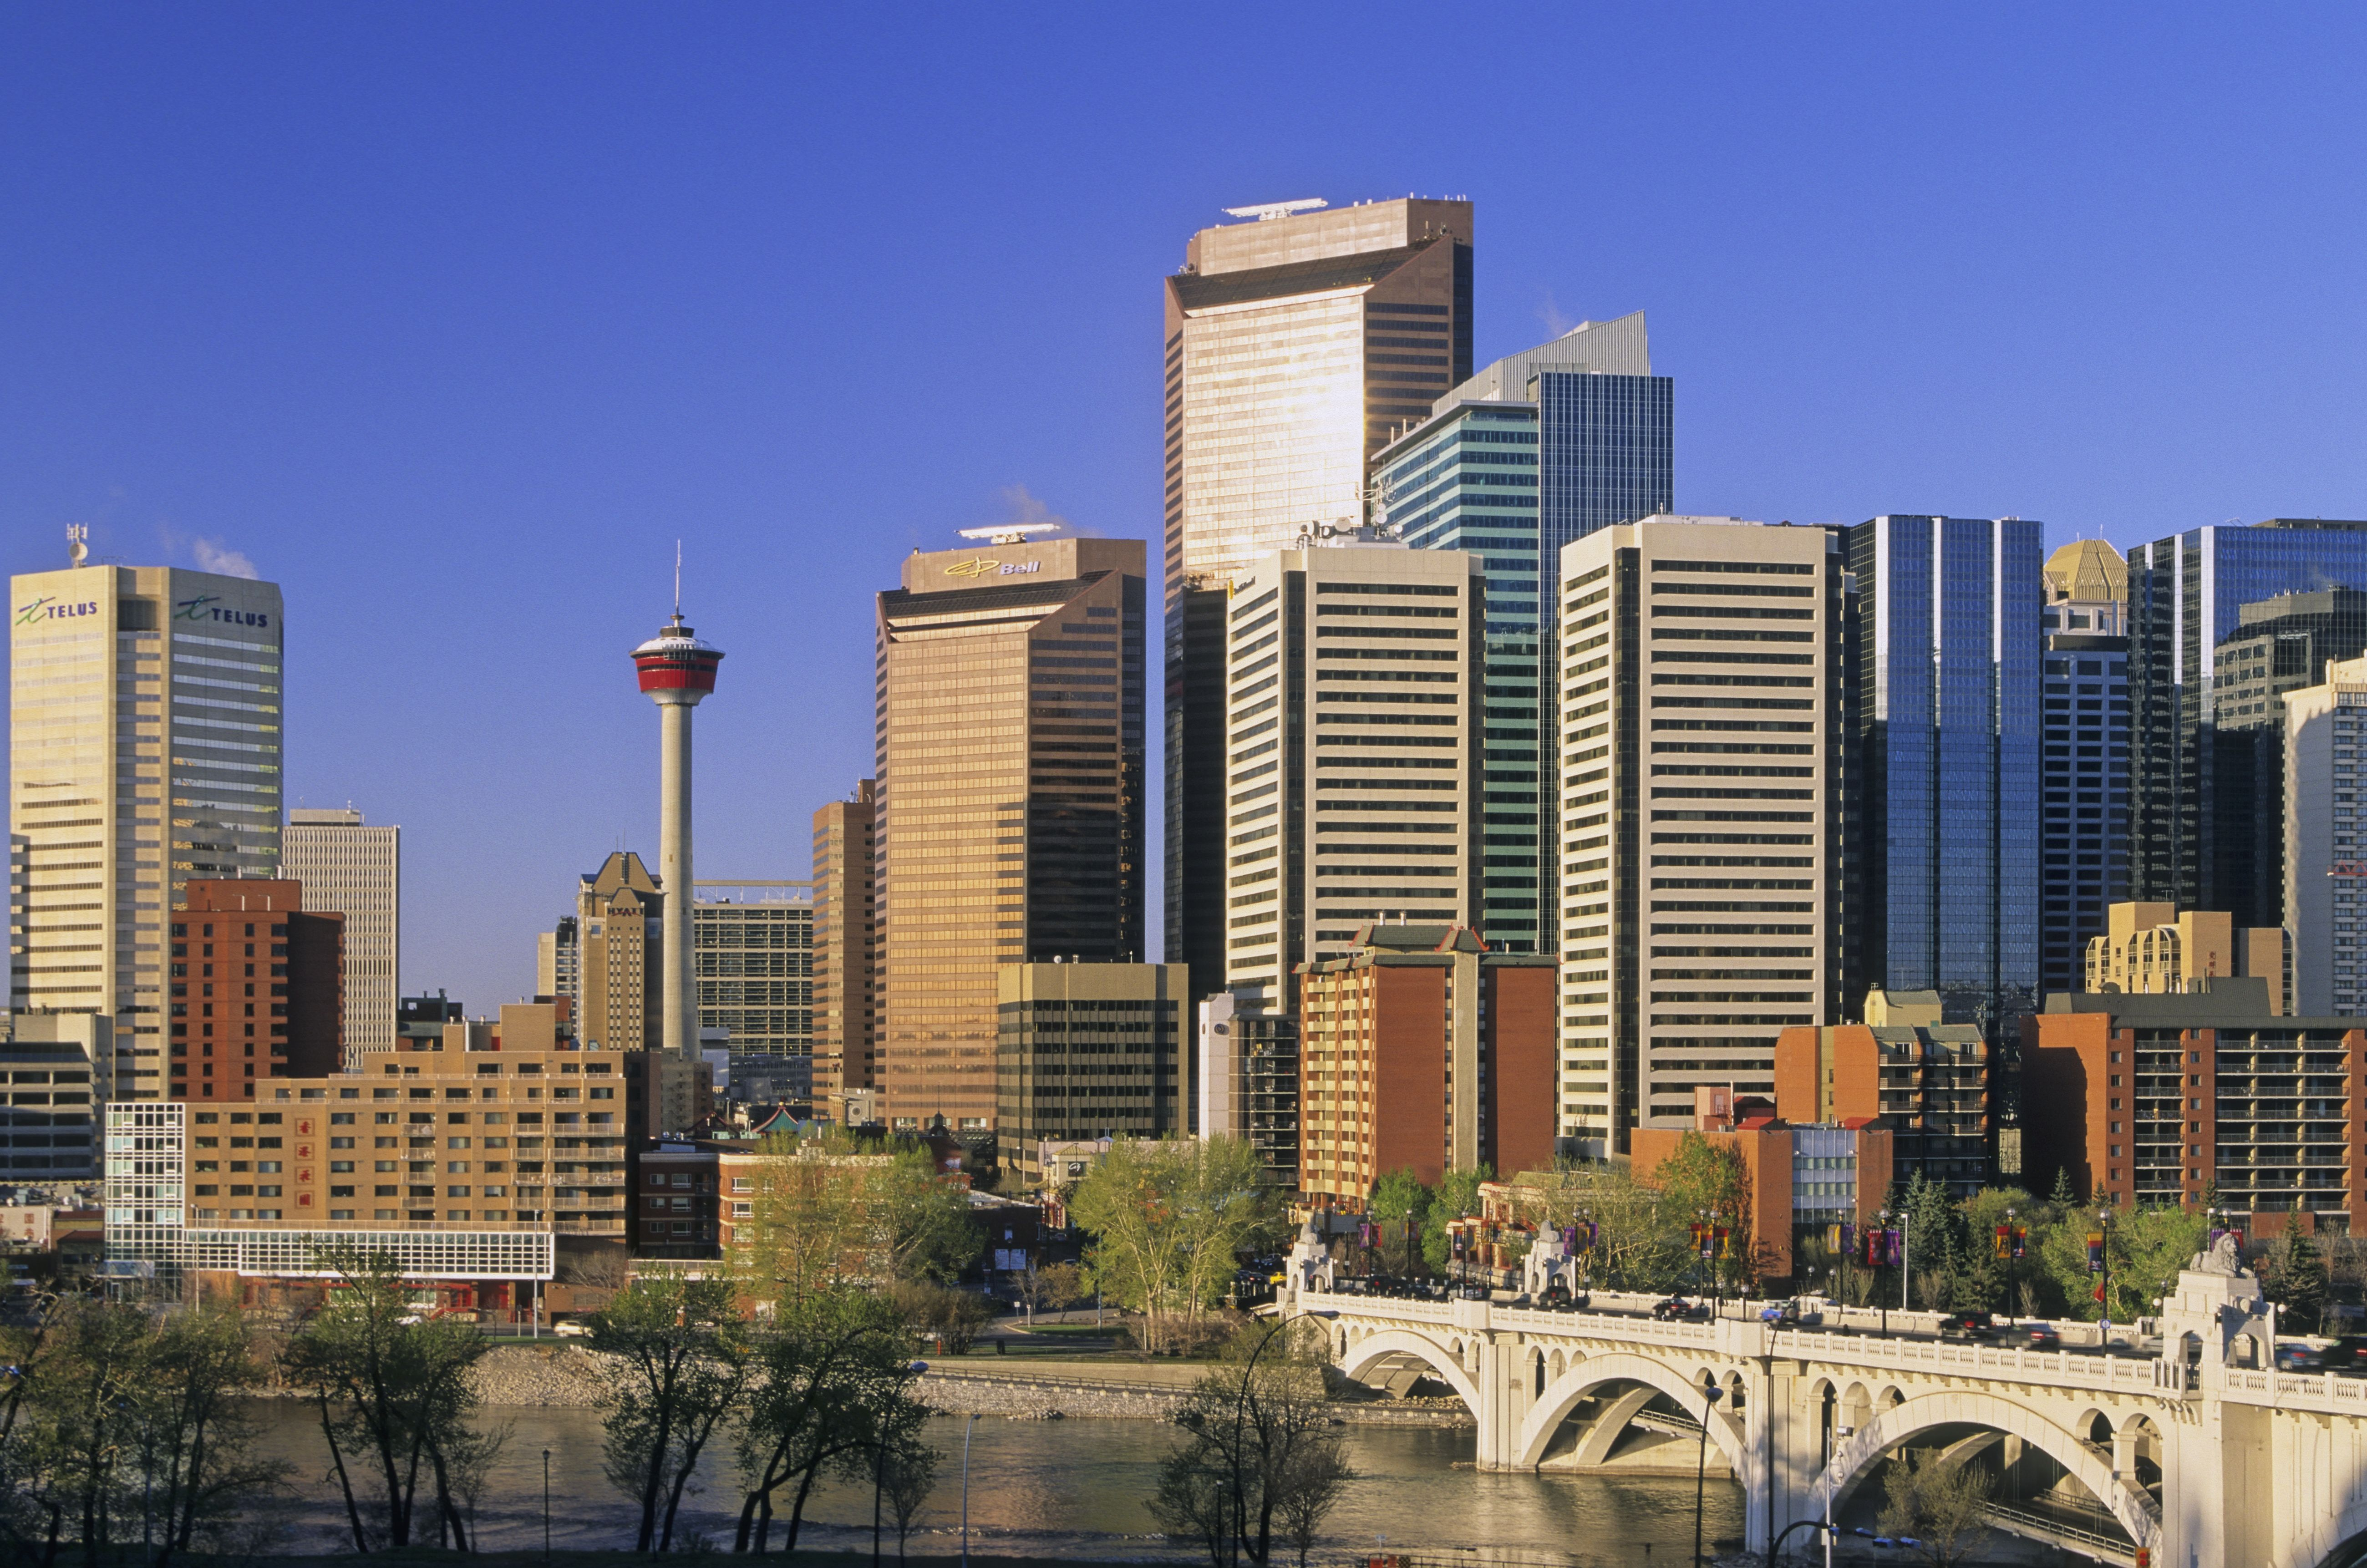 Canada, Alberta, Calgary city skyline across Bow River in day time